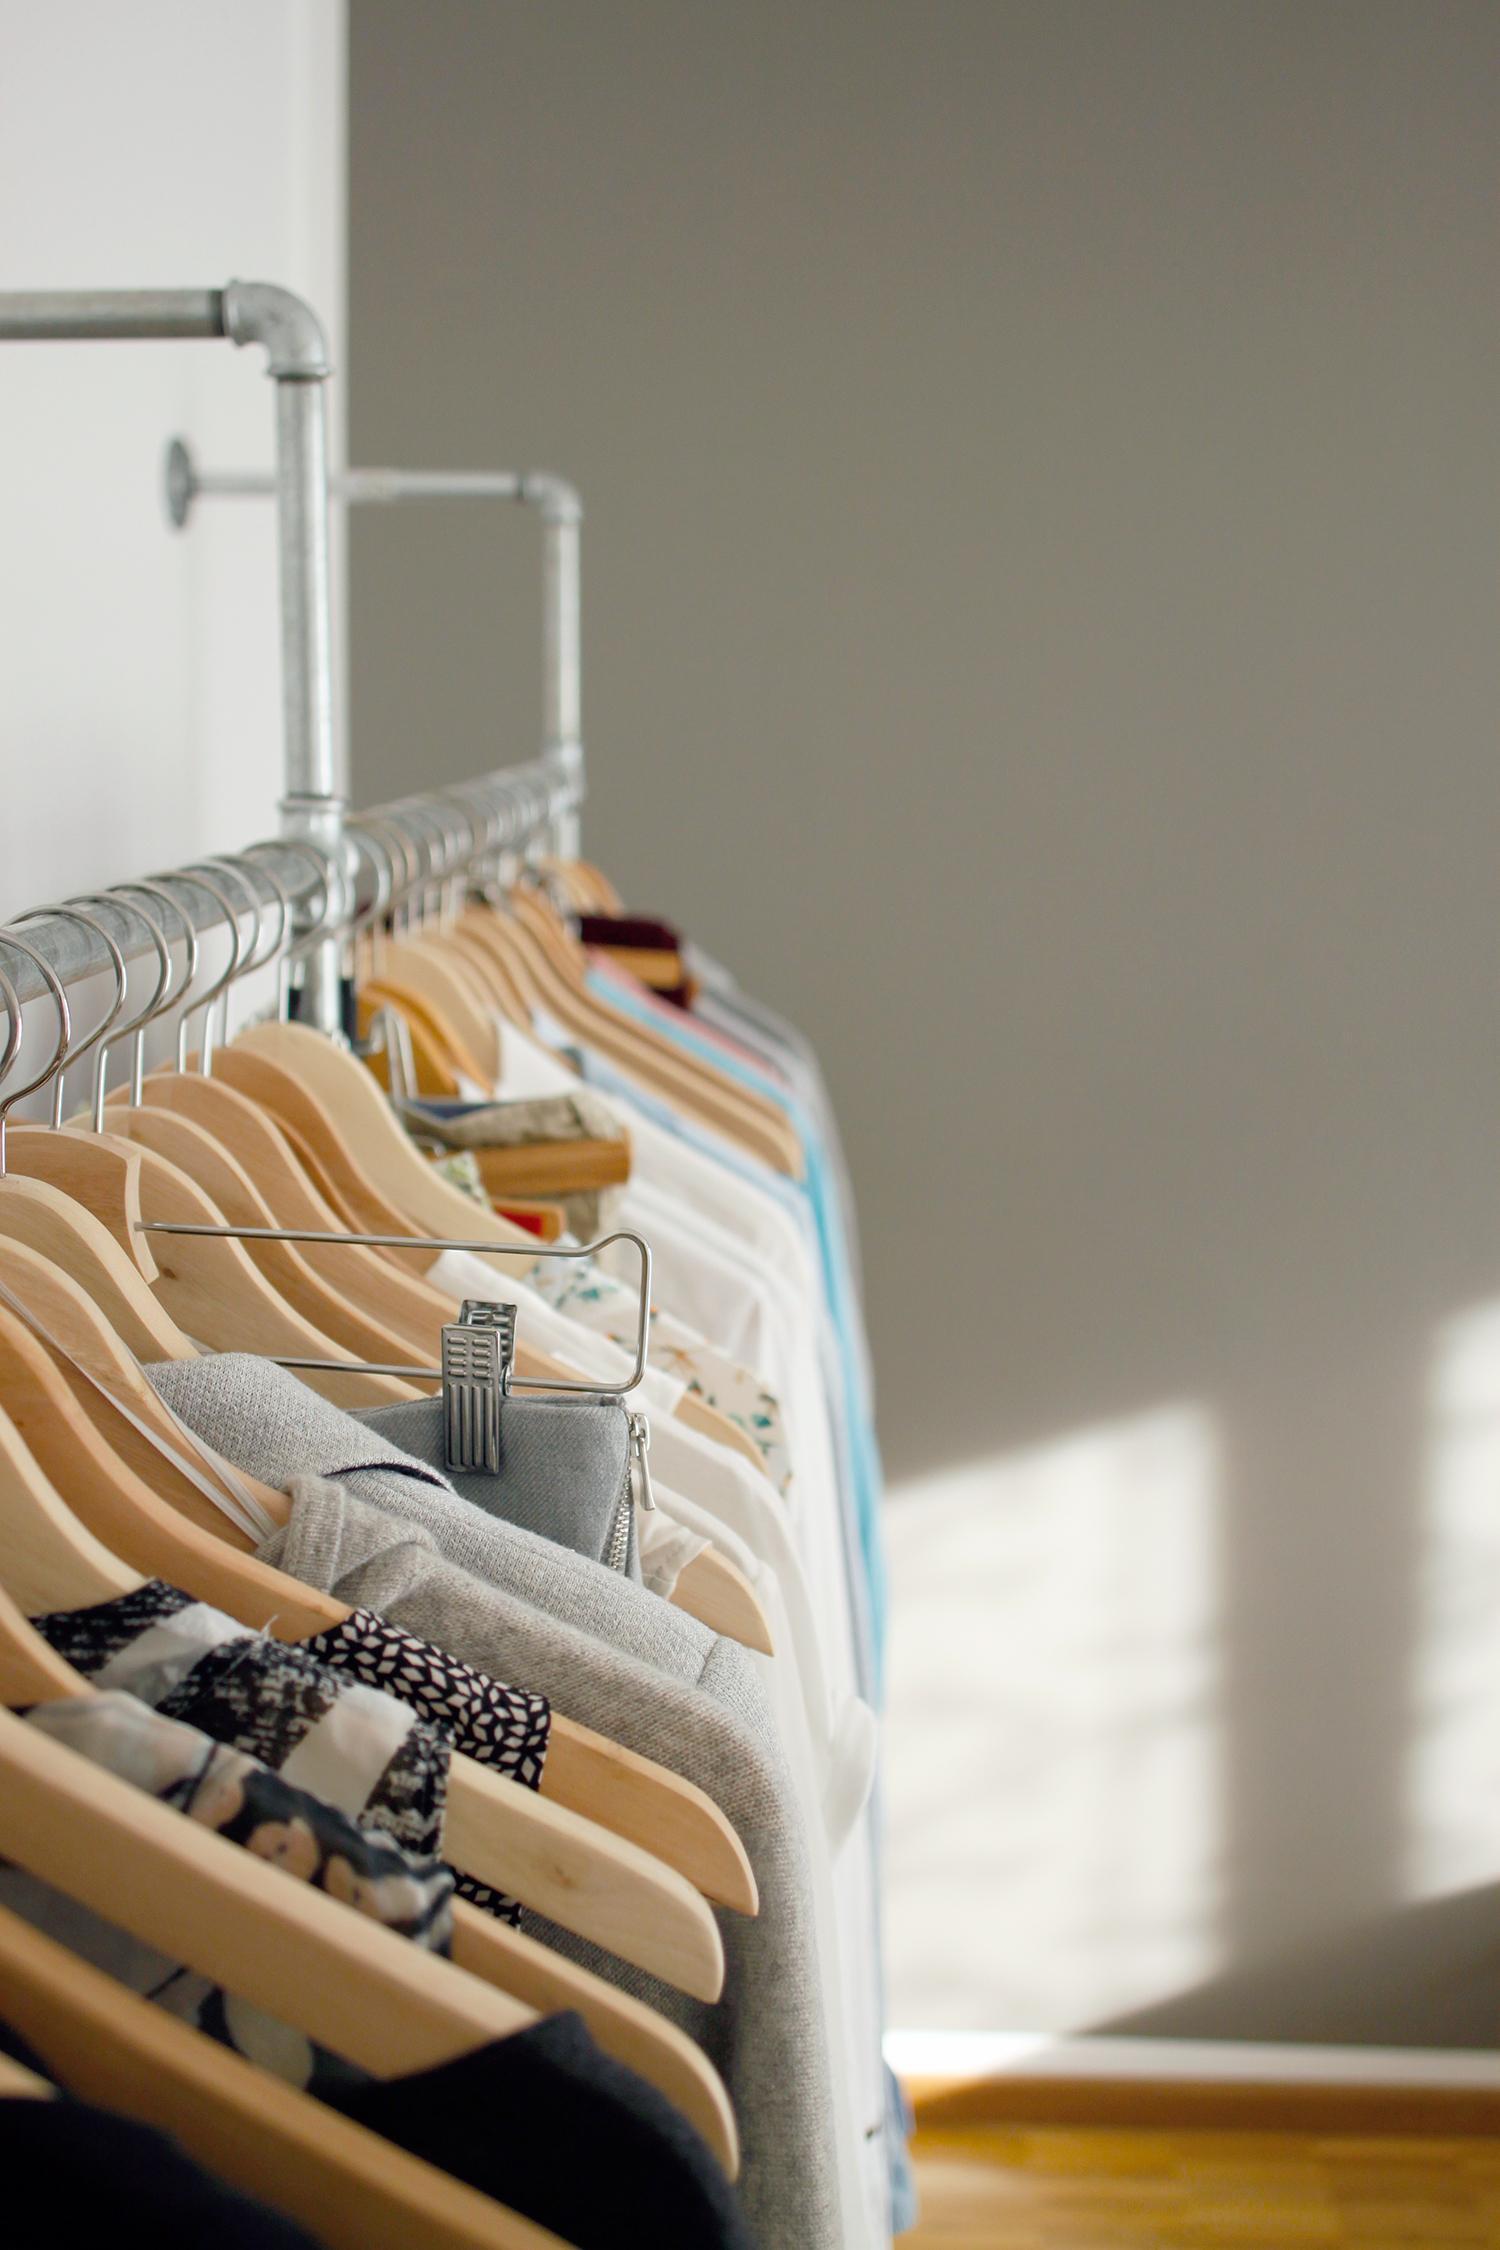 Garderobe Aus Stahlrohr Diy Designergarderobe Garderobe Kleiderschrank  D2e34db4 9ce1 4275 A087 6e8512c0991a